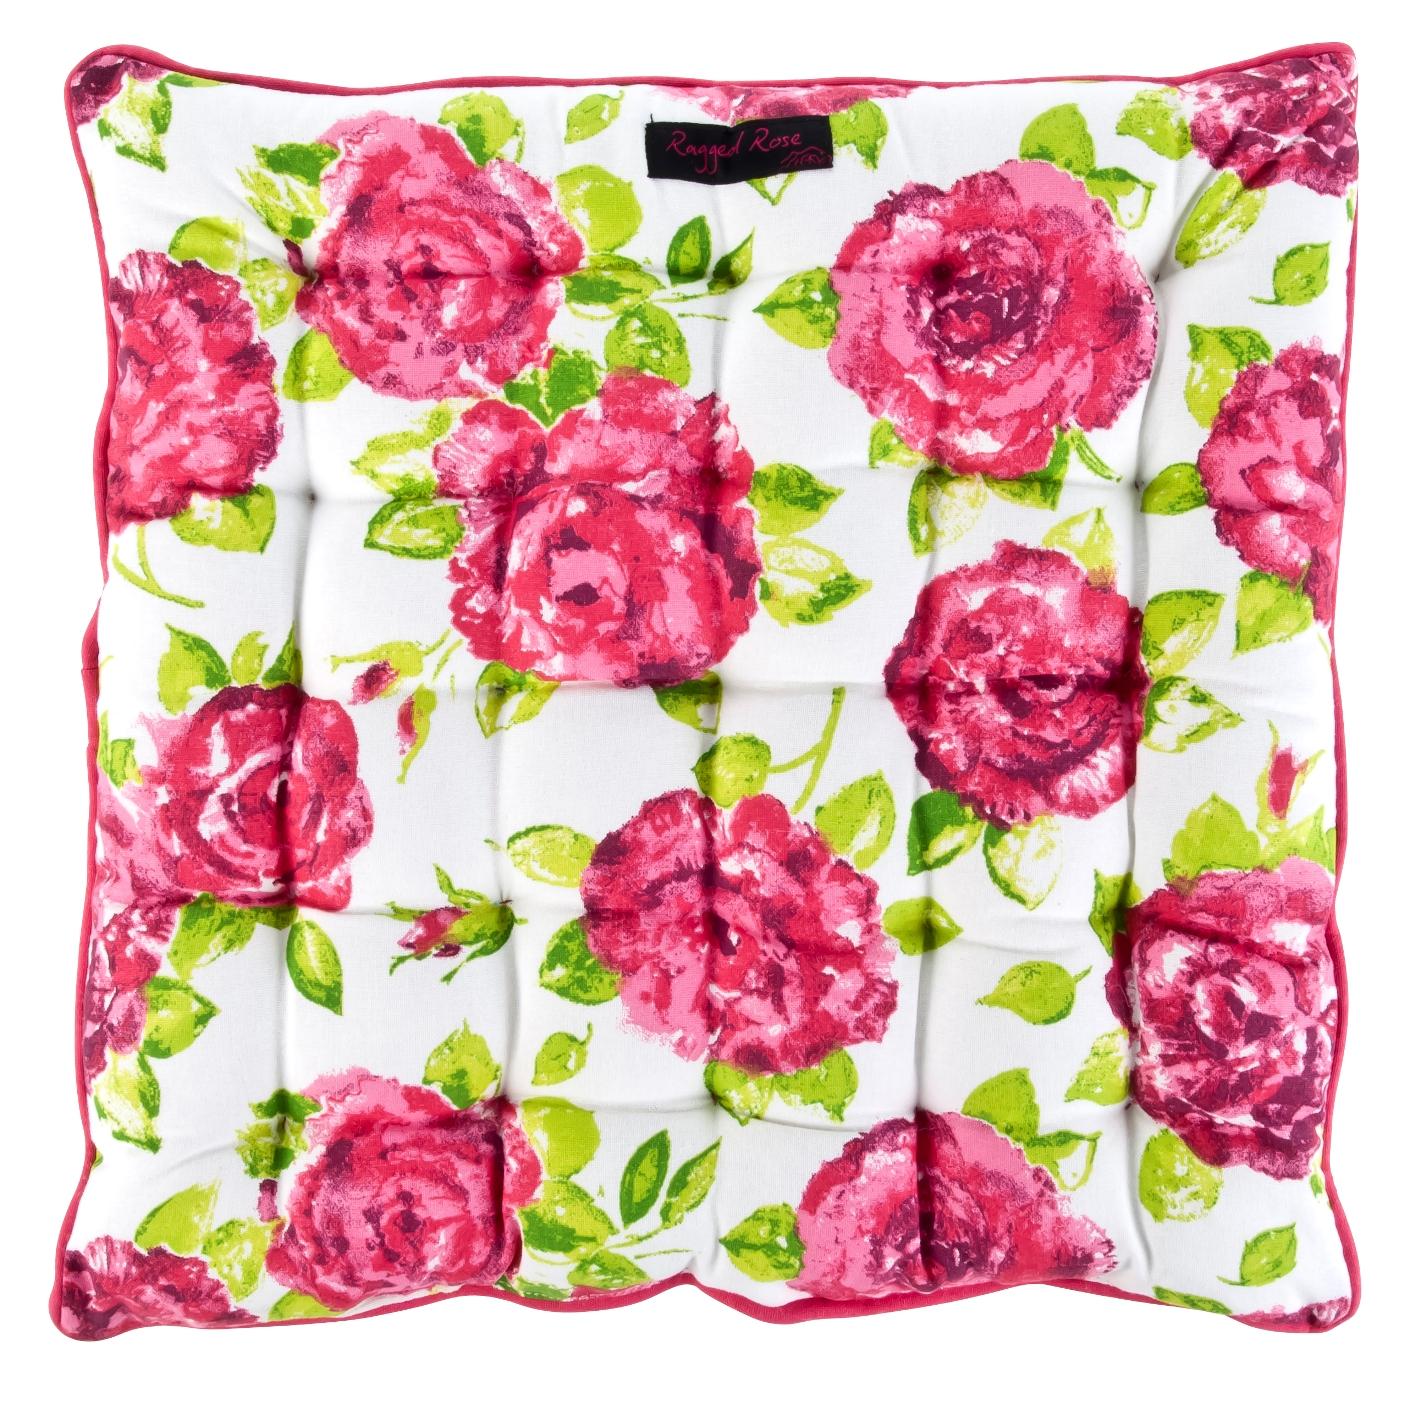 White & Rose Seat Pad Cushion ~ €21.50